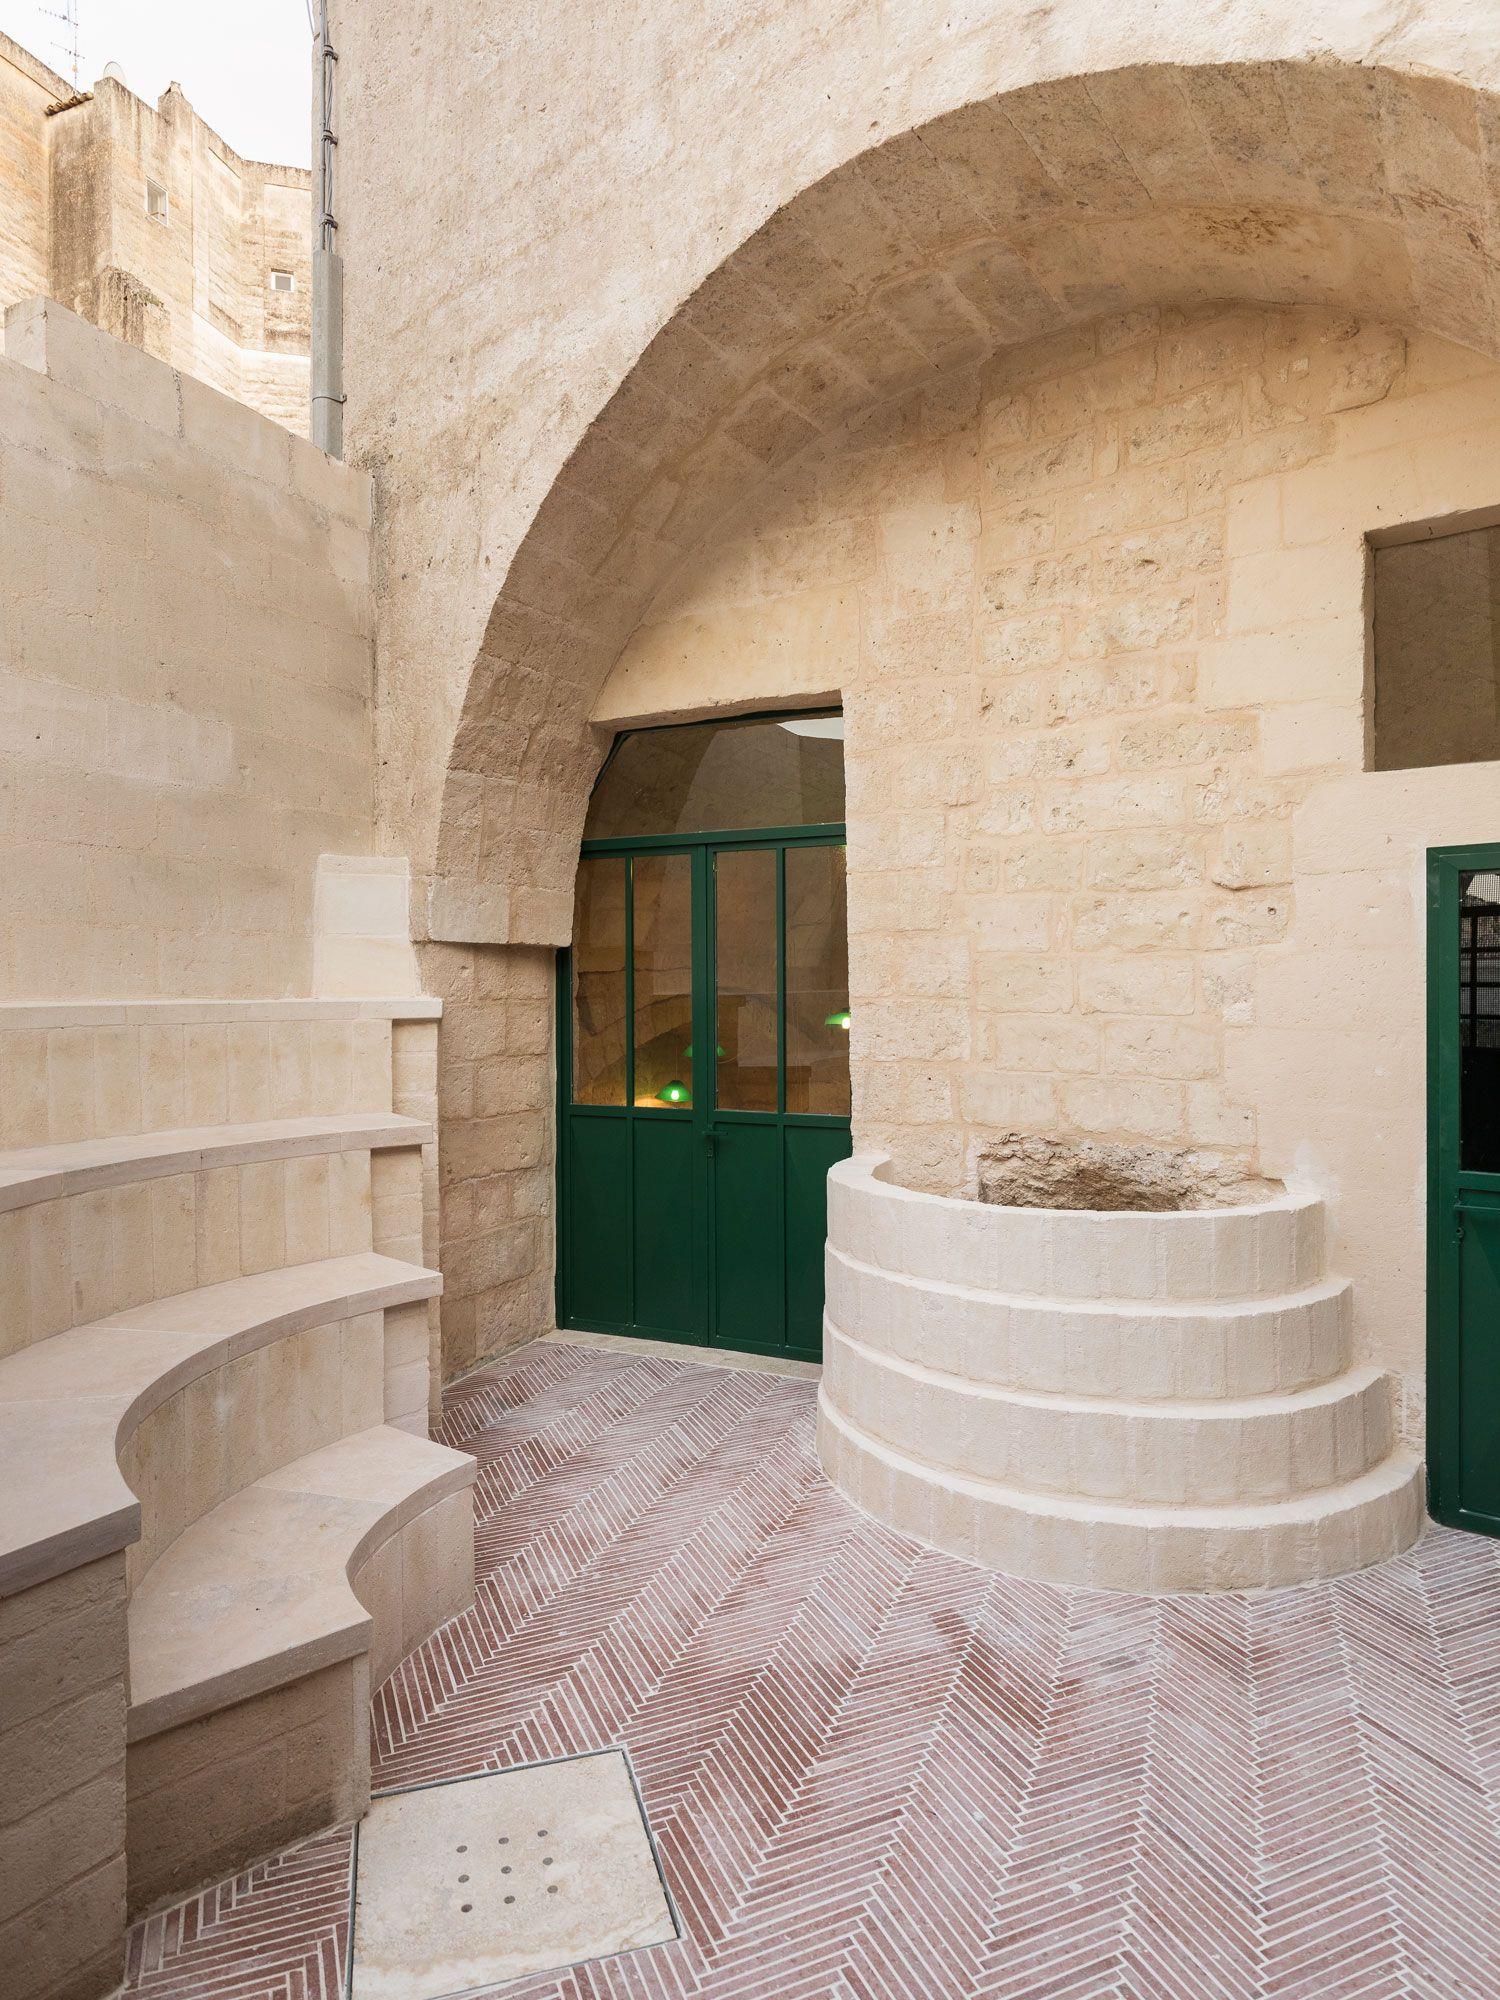 Enoteca dai Tosi in Matera, Italy by Architecten De Vylder Vinck ...